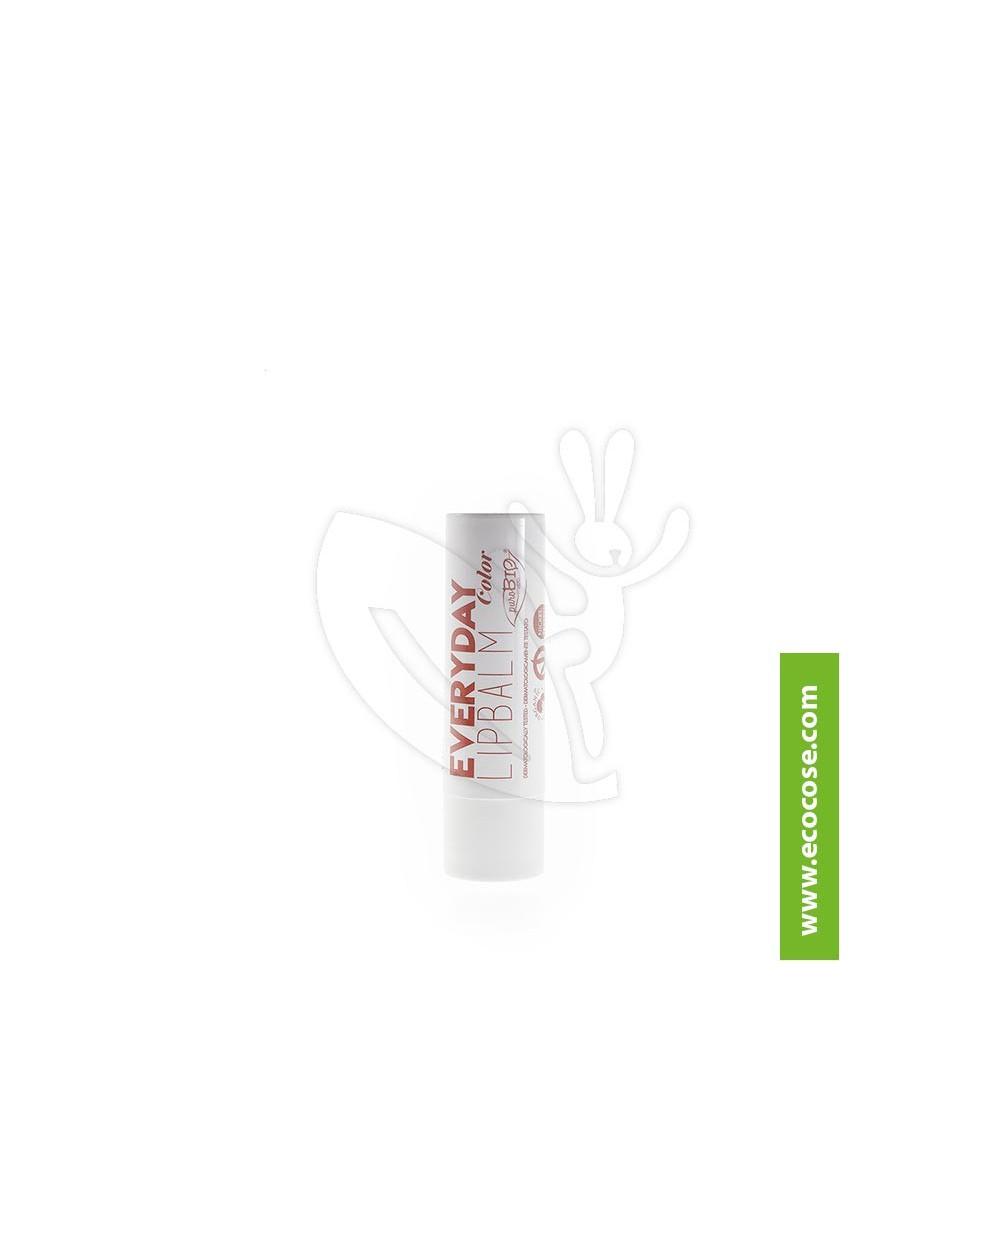 PuroBIO Cosmetics - Lipbalm Everyday COLOR *NEW*